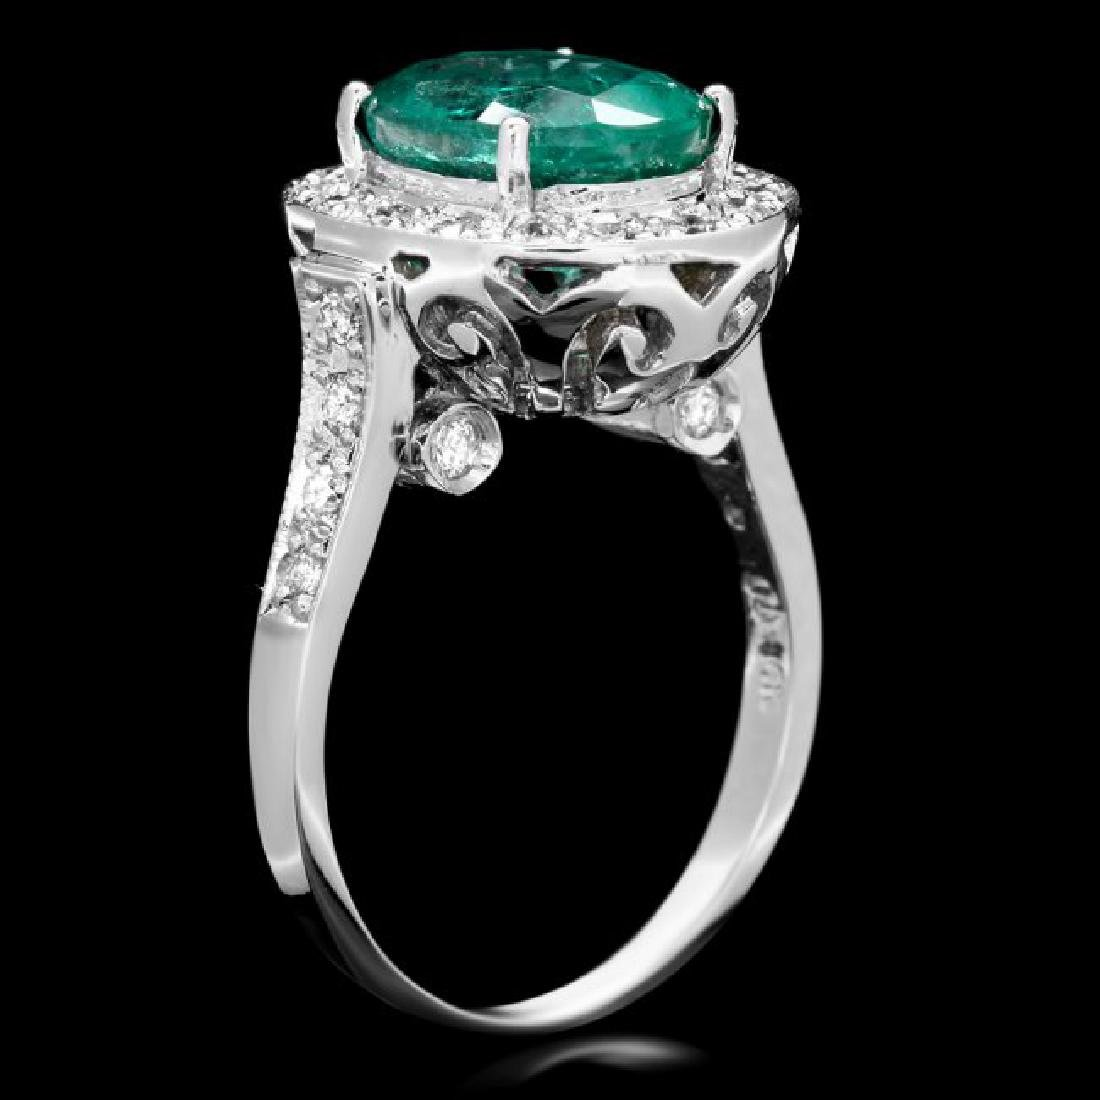 14k White Gold 3.50ct Emerald 0.70ct Diamond Ring - 3